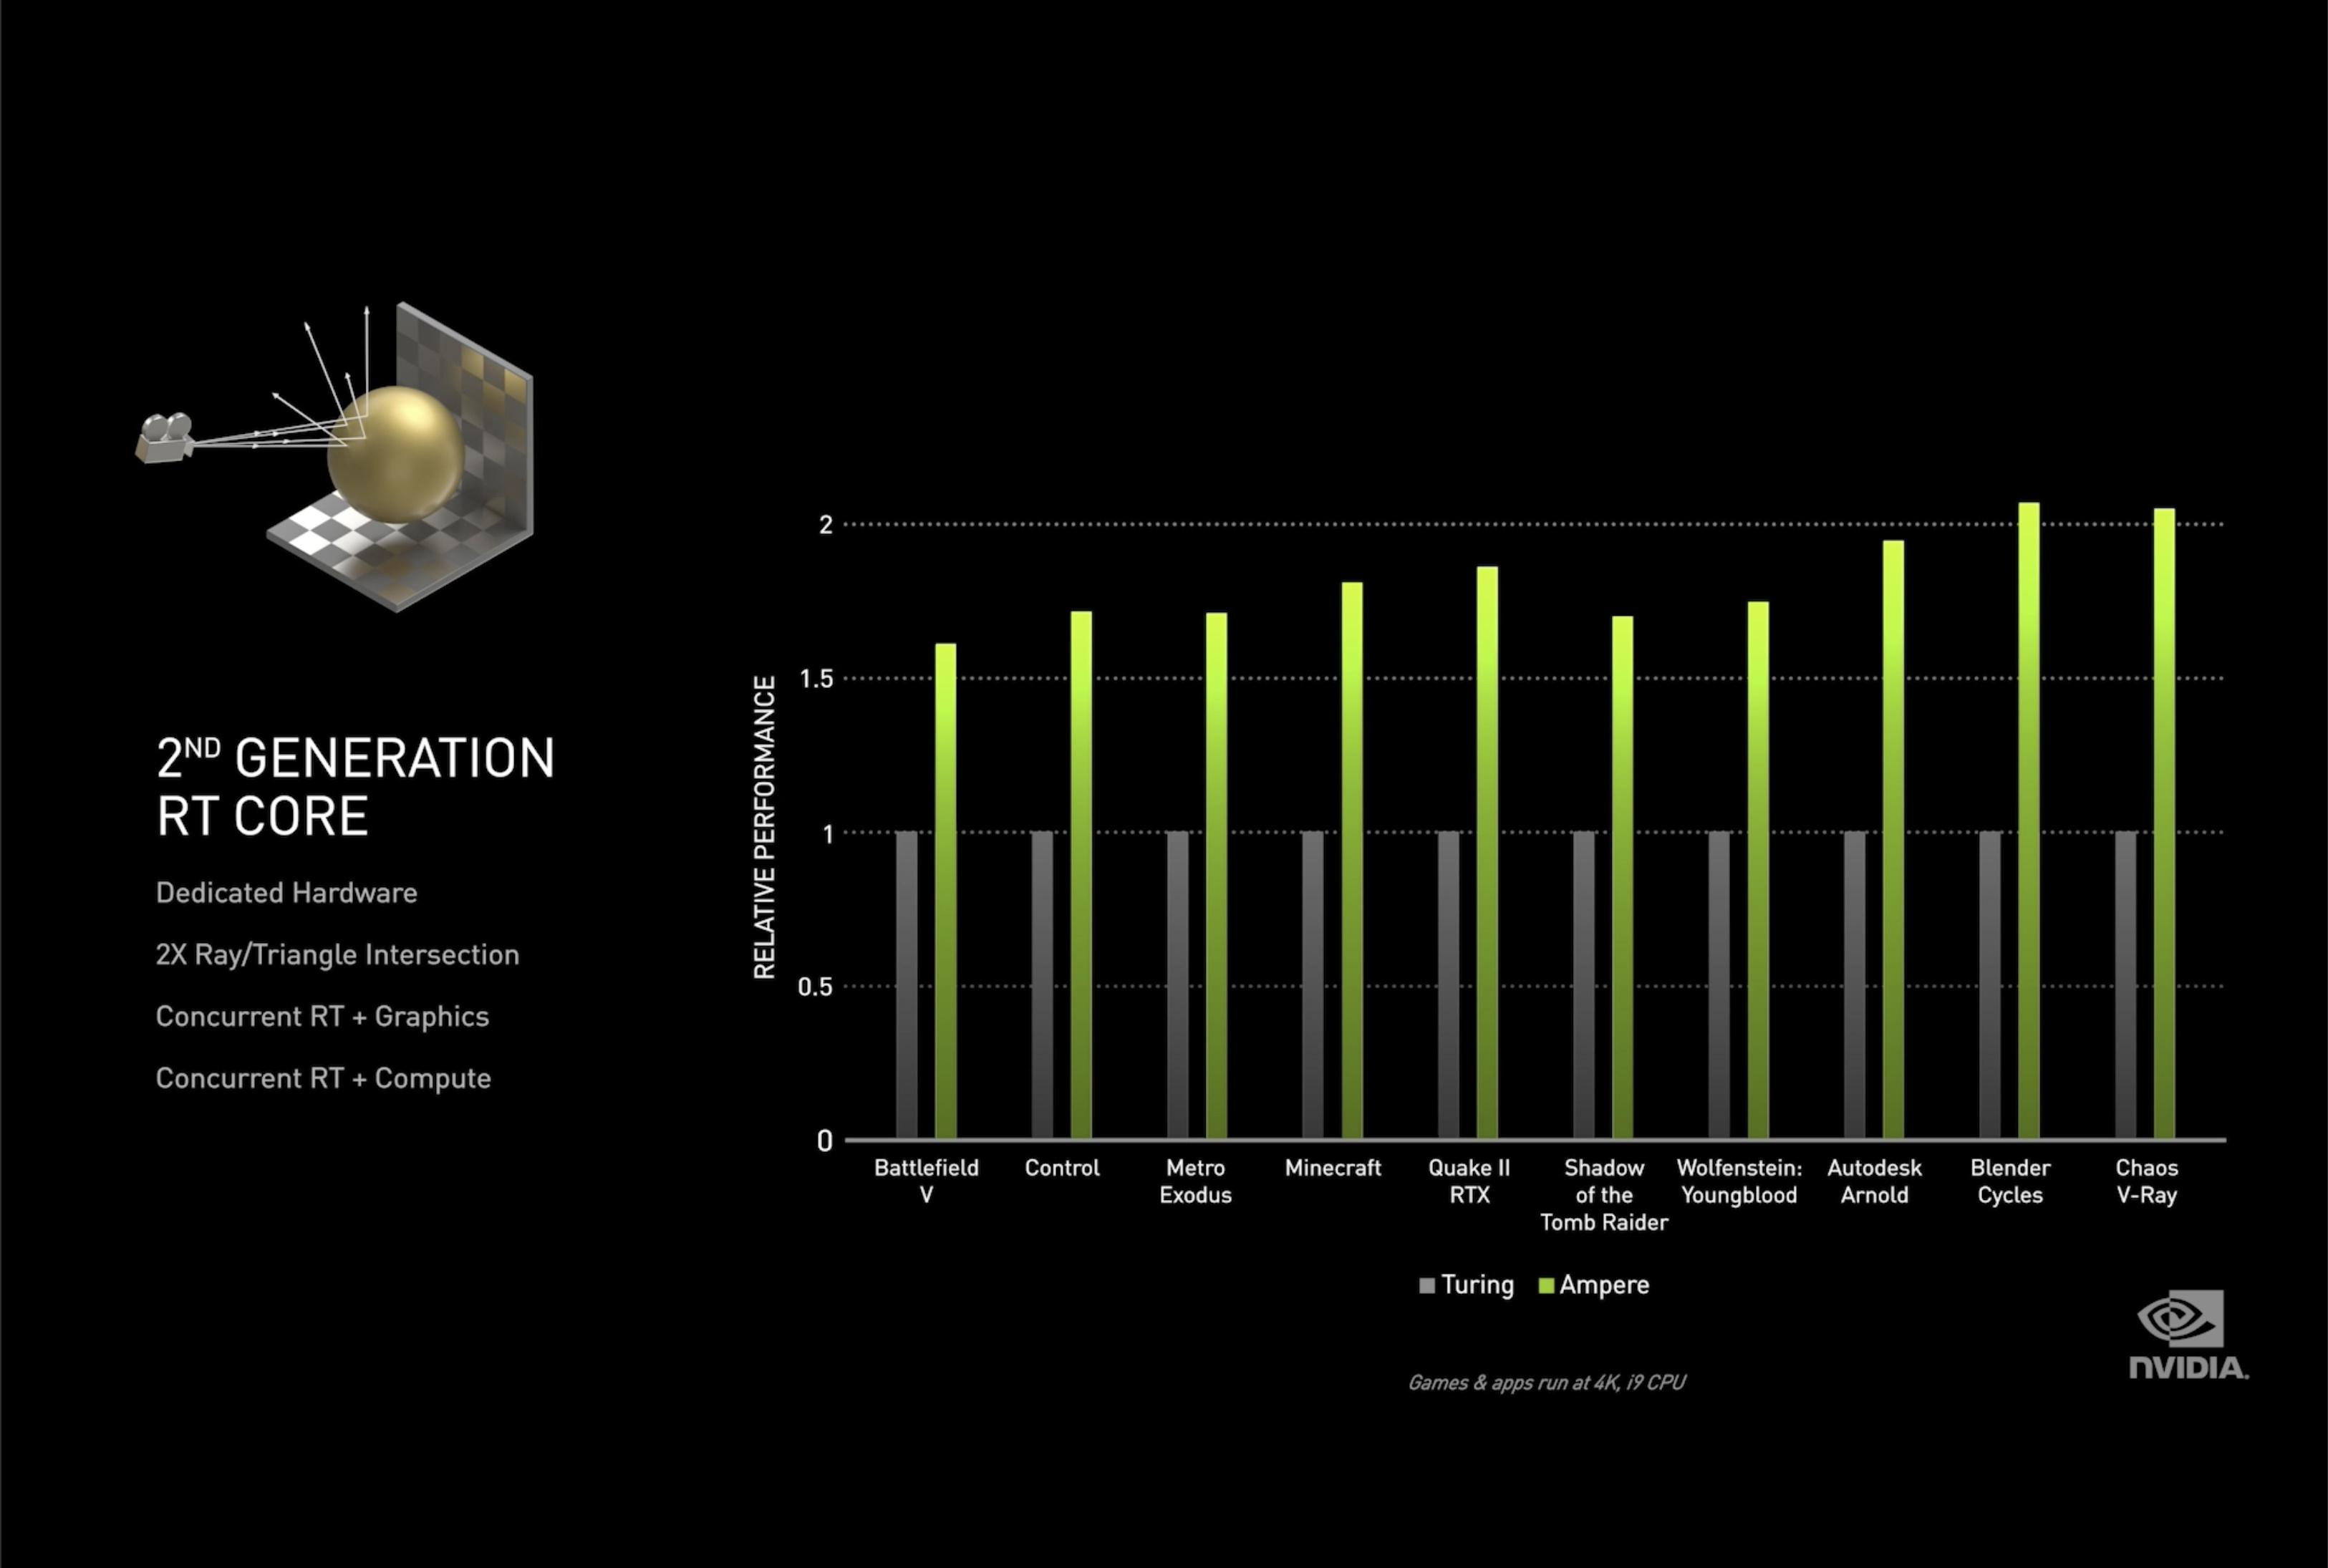 Aumento del rendimiento de RTX 30 sobre RTX 20